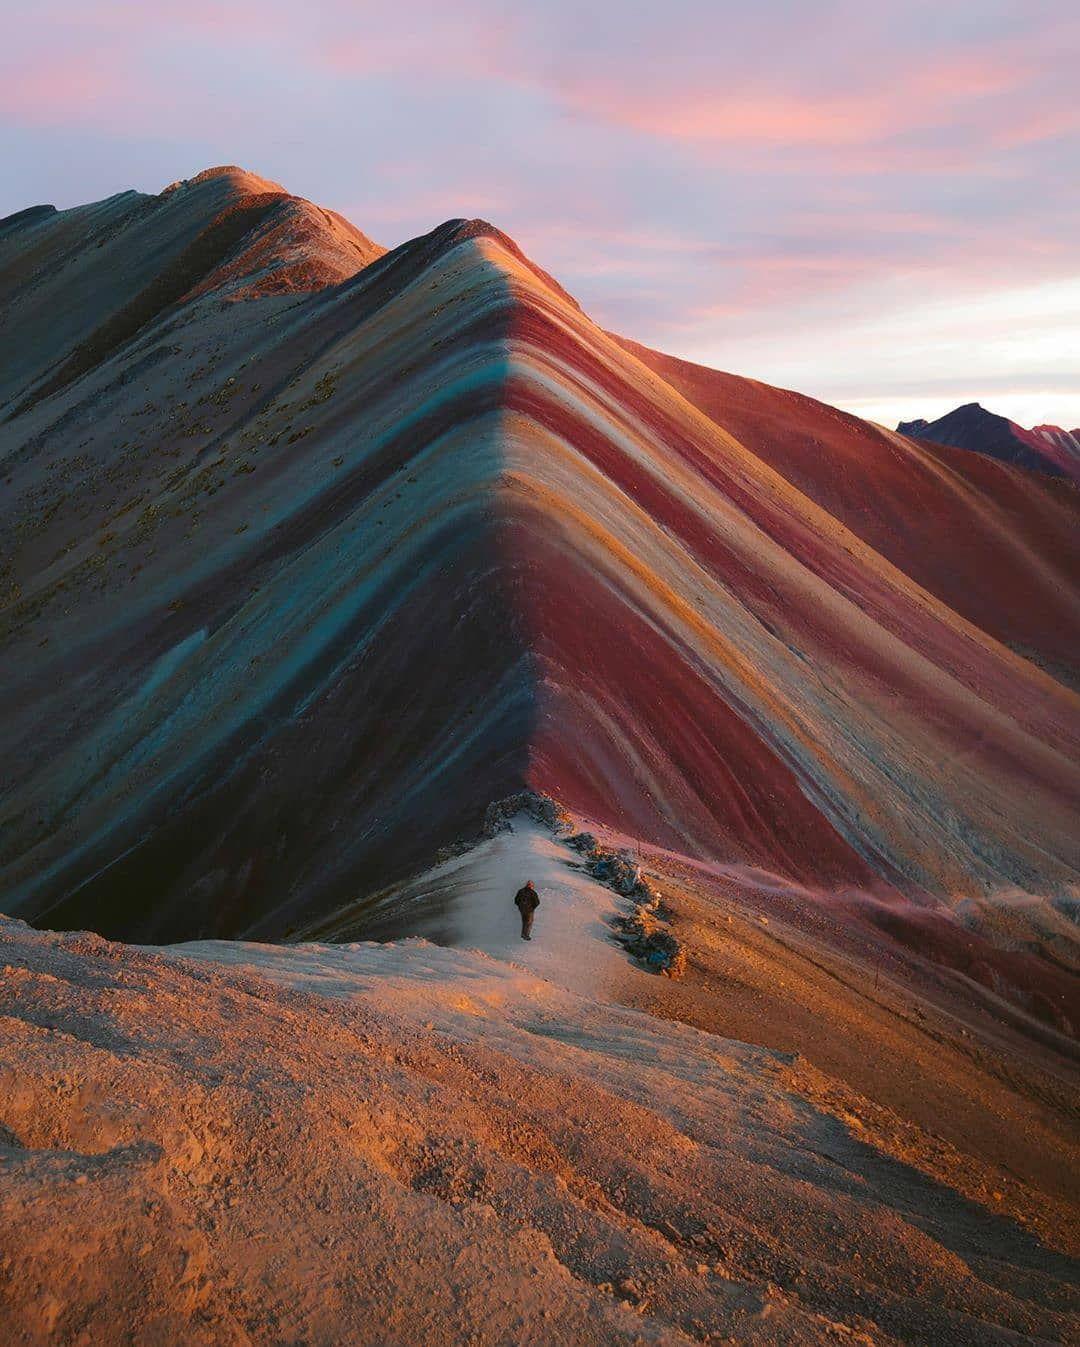 High In The Andes Of Peru You Can Find Rainbow Mountains In 2020 Regenbogen Berge Sudamerika Bilder